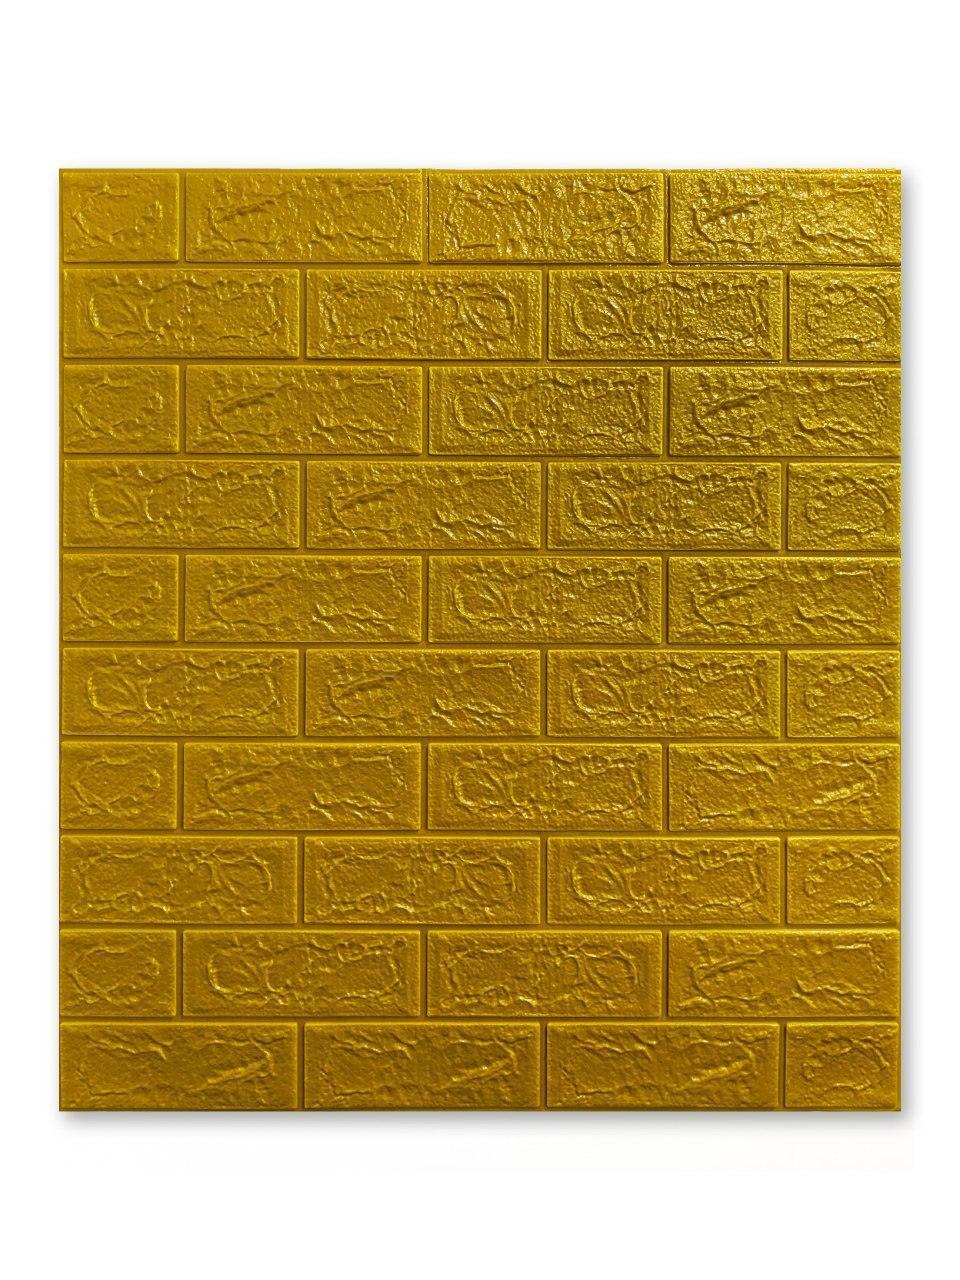 Самоклеящаяся декоративная панель с 3D текстурой под кирпич, Золото, 700x770x5мм